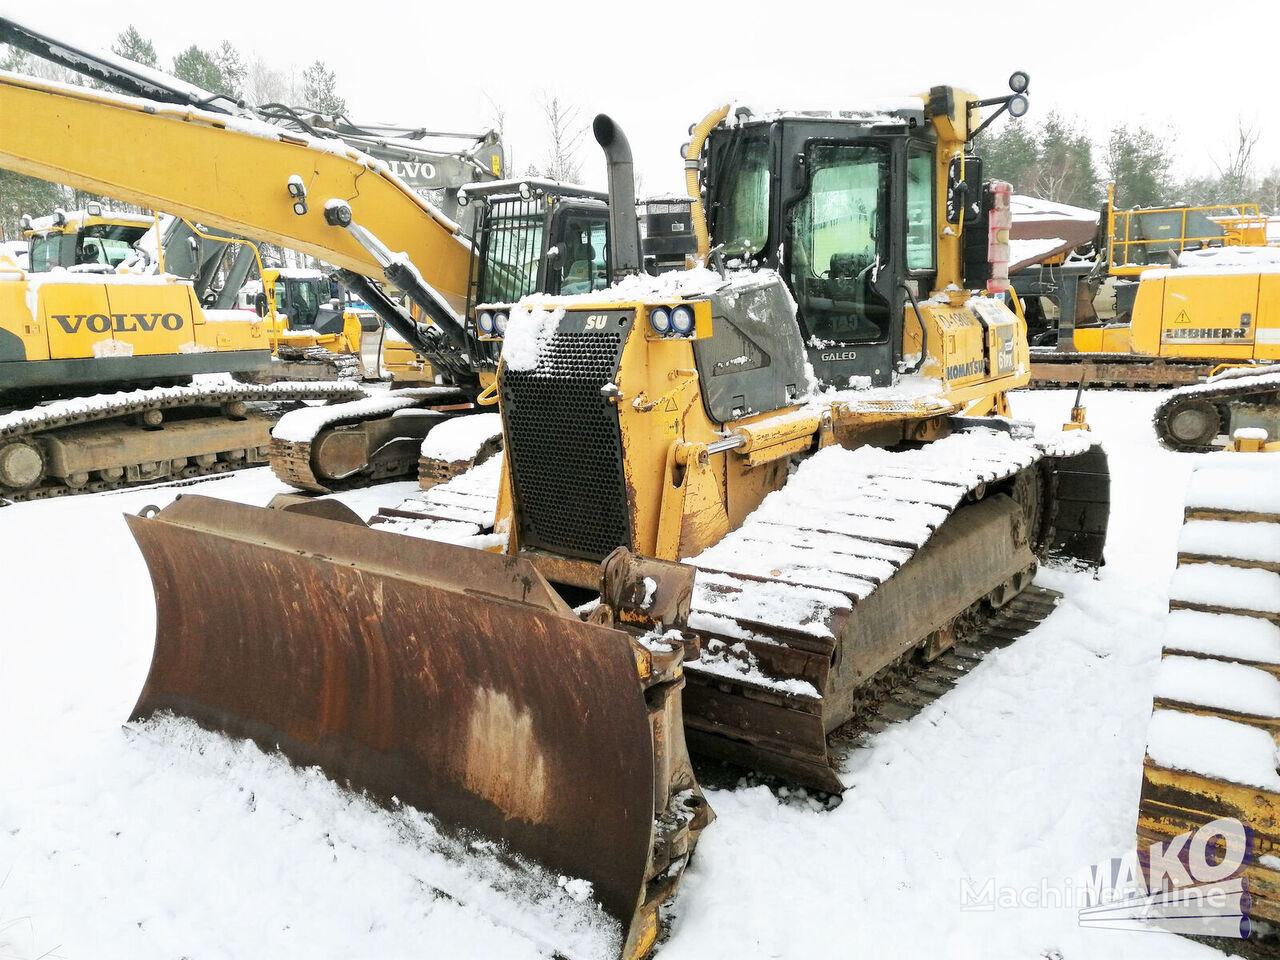 KOMATSU D61PX-15 bulldozer